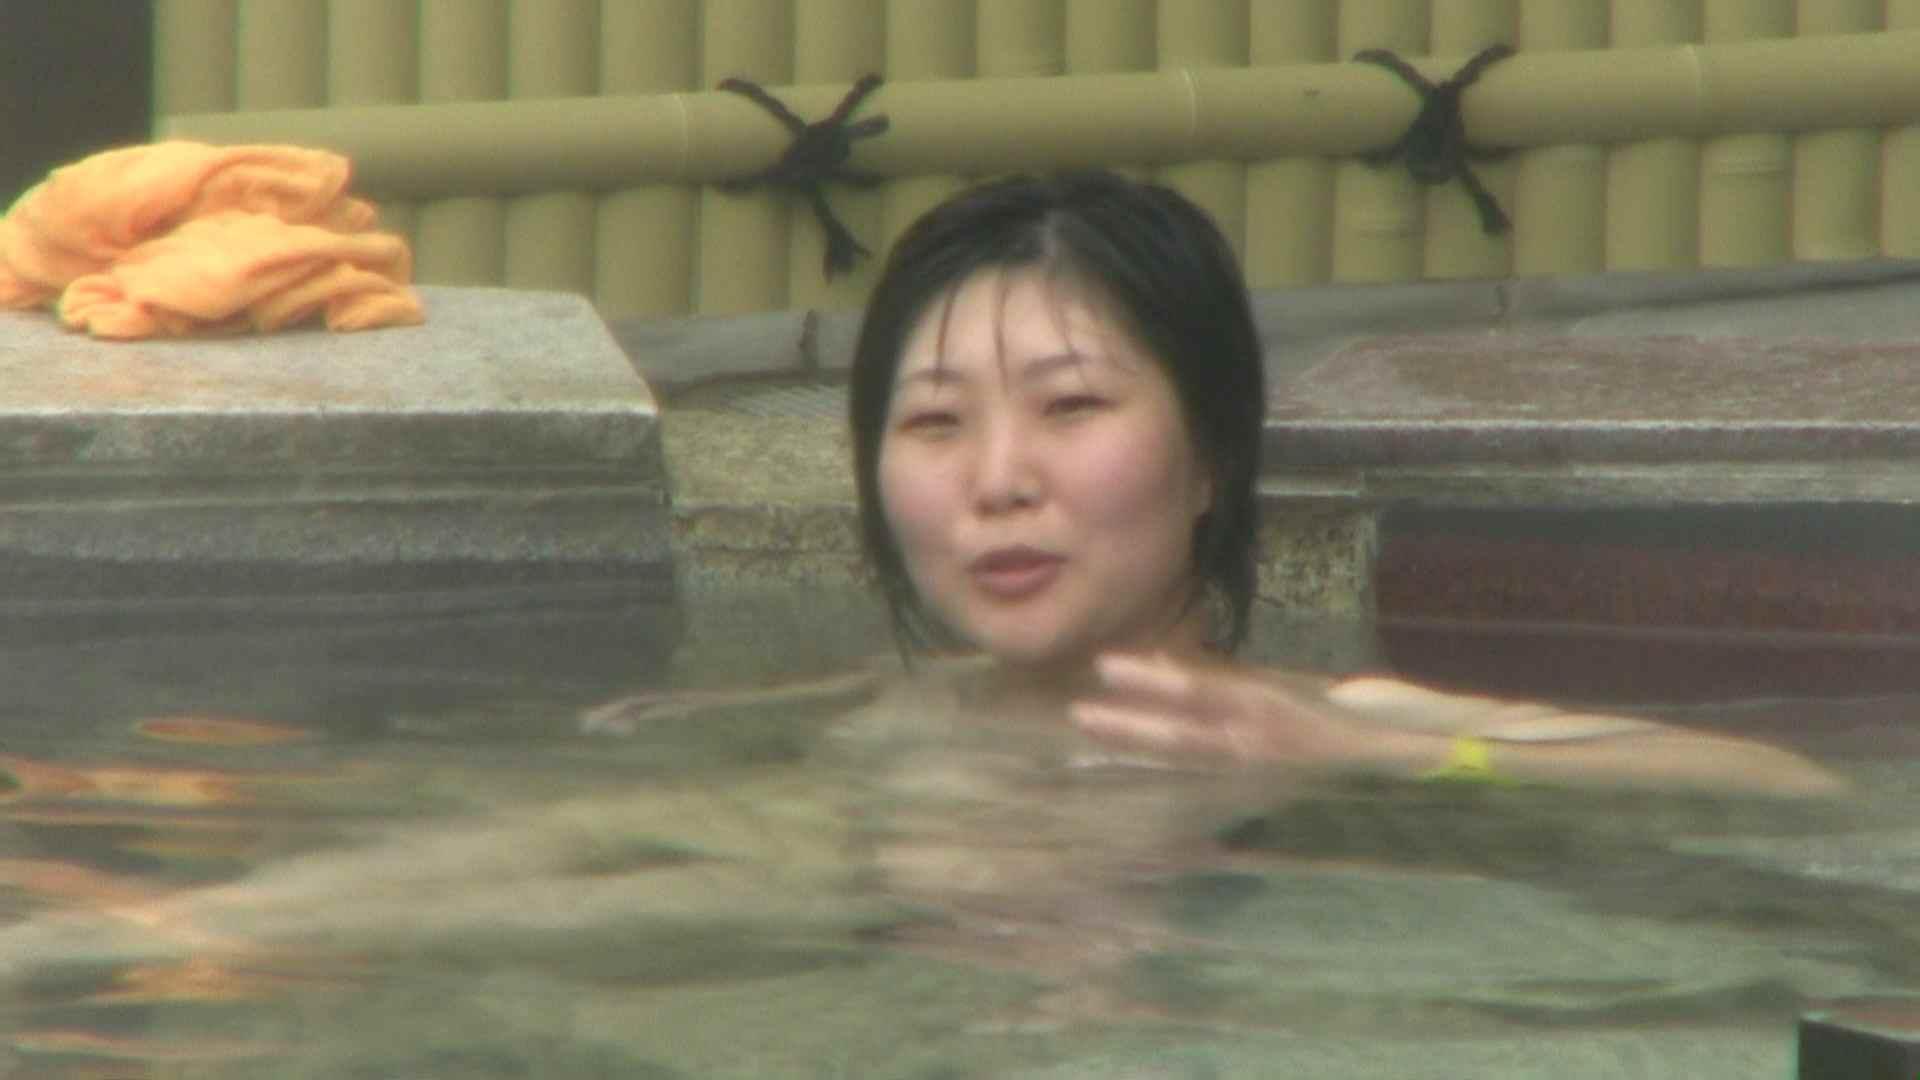 Aquaな露天風呂Vol.75【VIP限定】 露天風呂編 | 盗撮シリーズ  99PIX 99